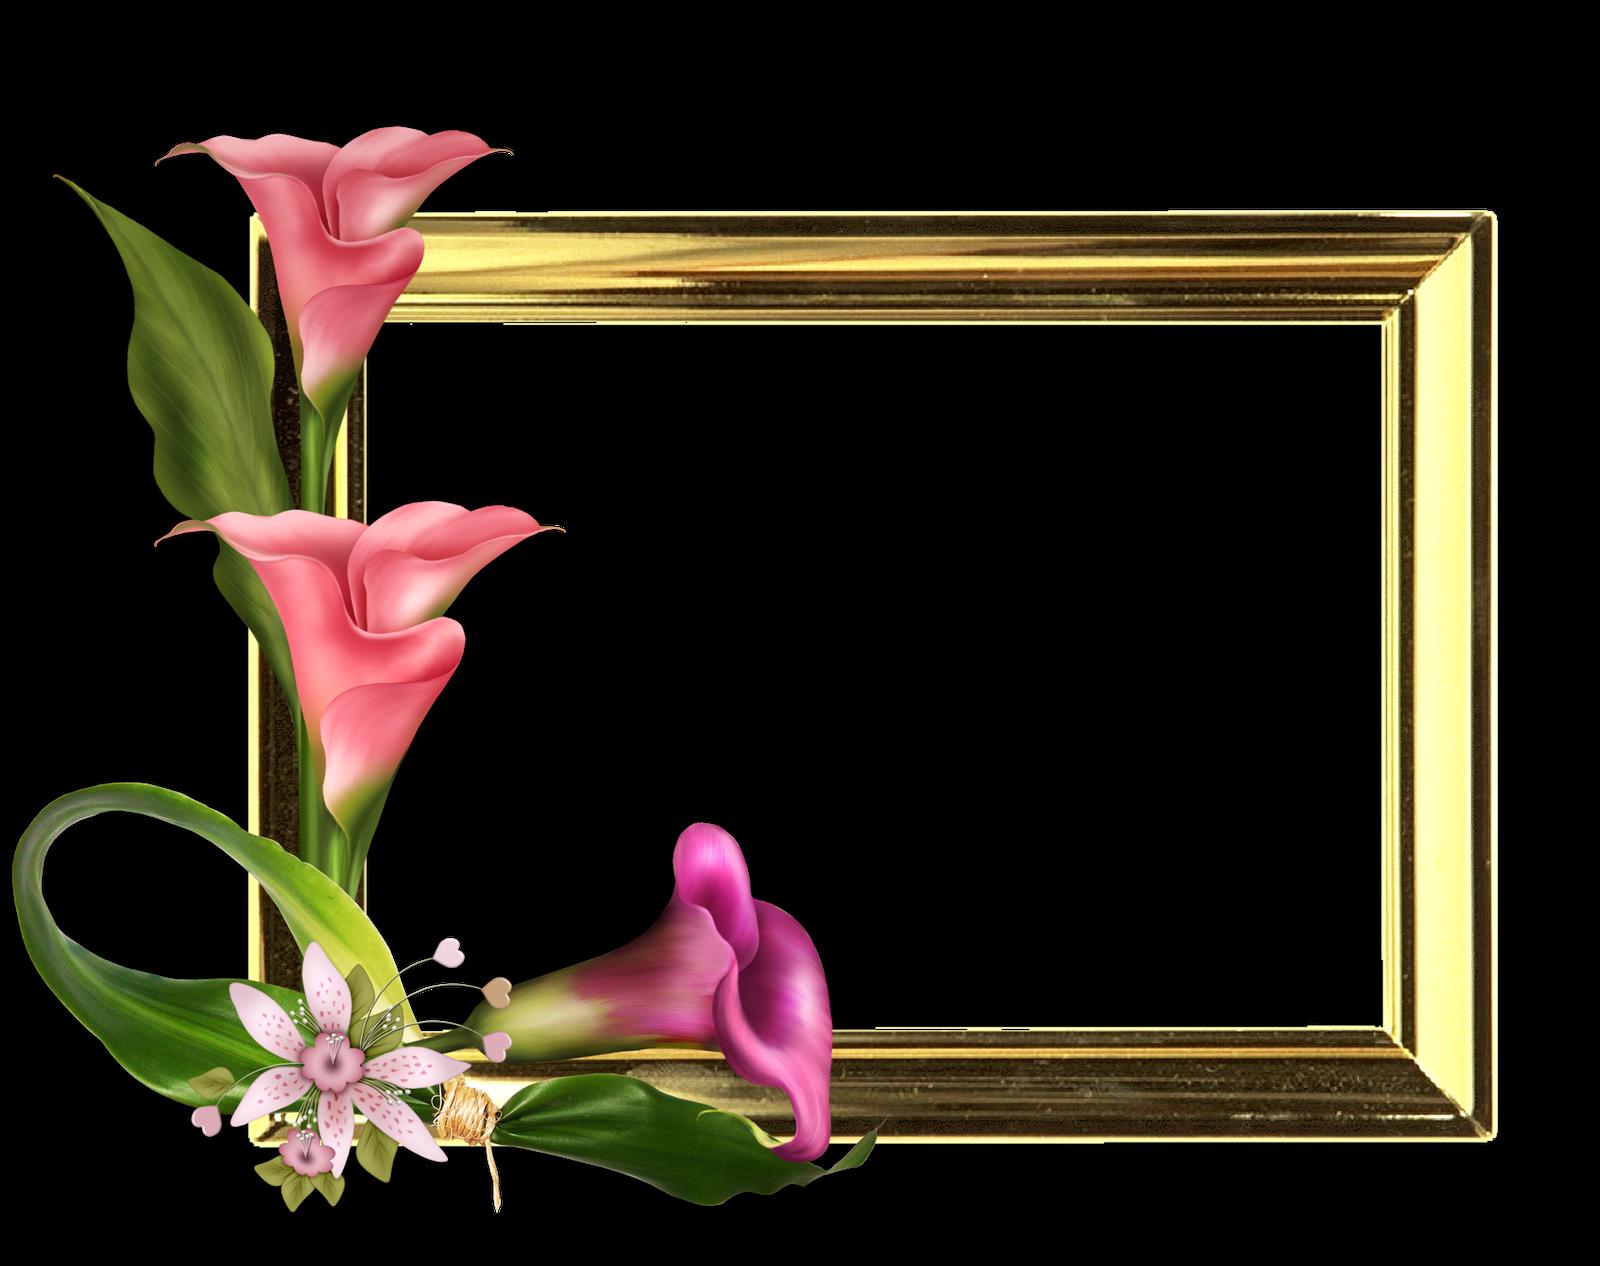 Colecci n de gifs marcos para fotos de flores - Marcos fotos pared ...